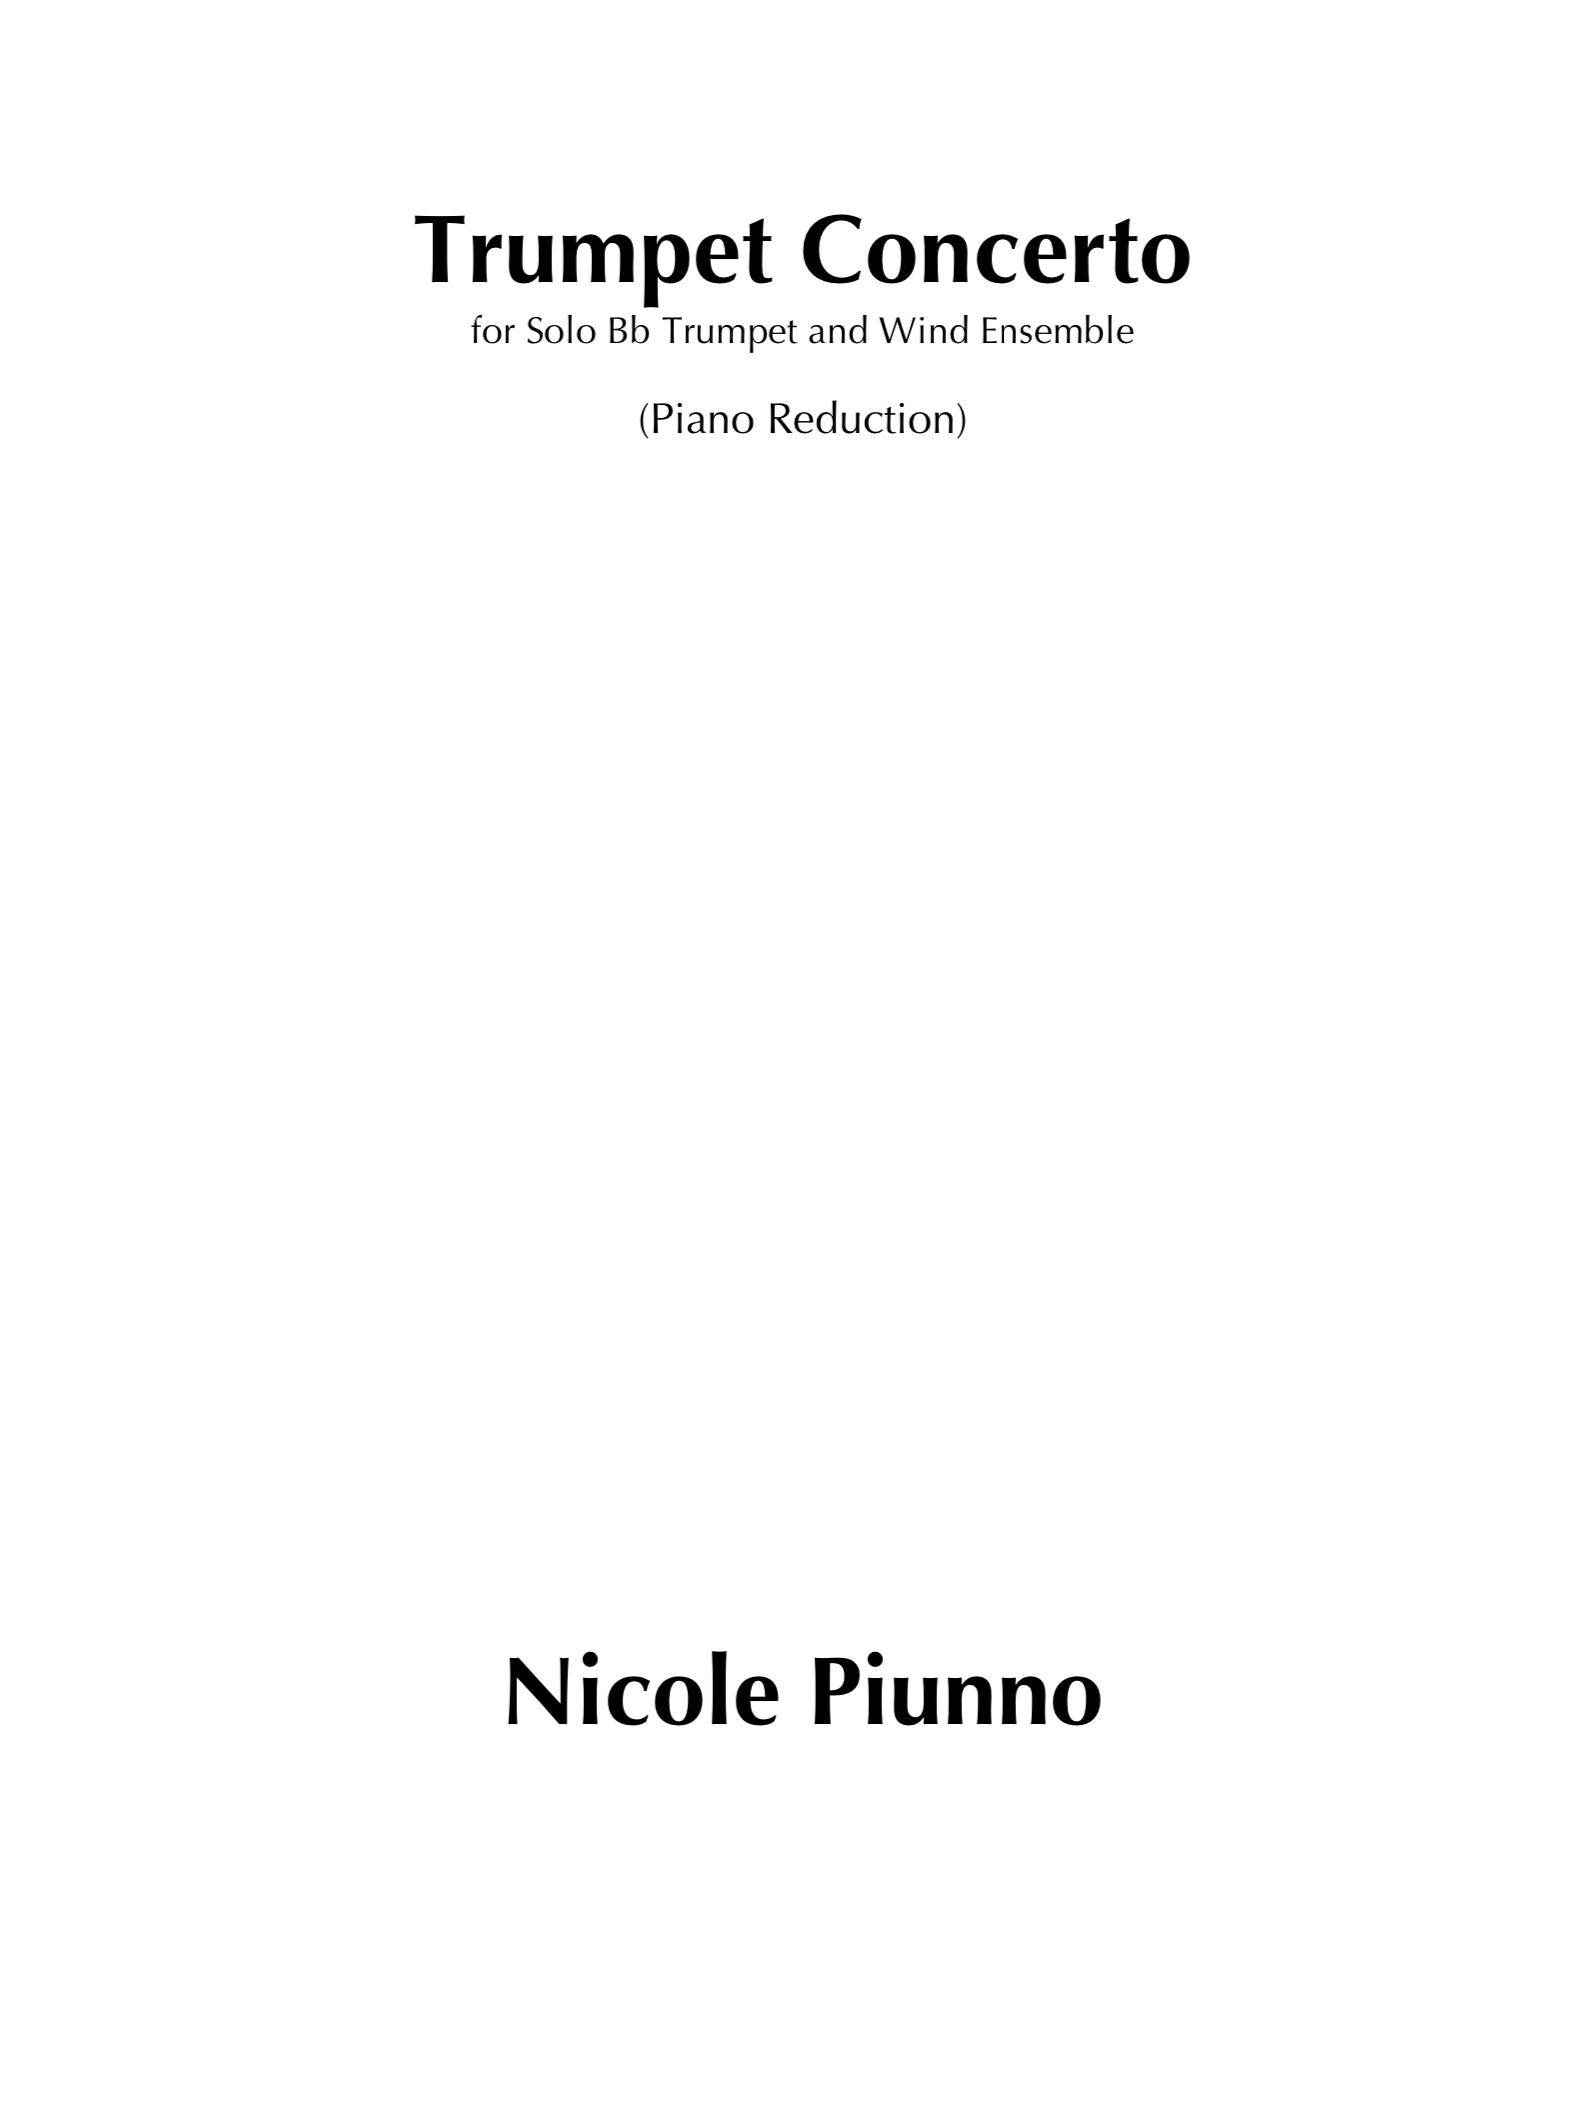 Trumpet Concerto-Piano Reduction by Nicole Piunno